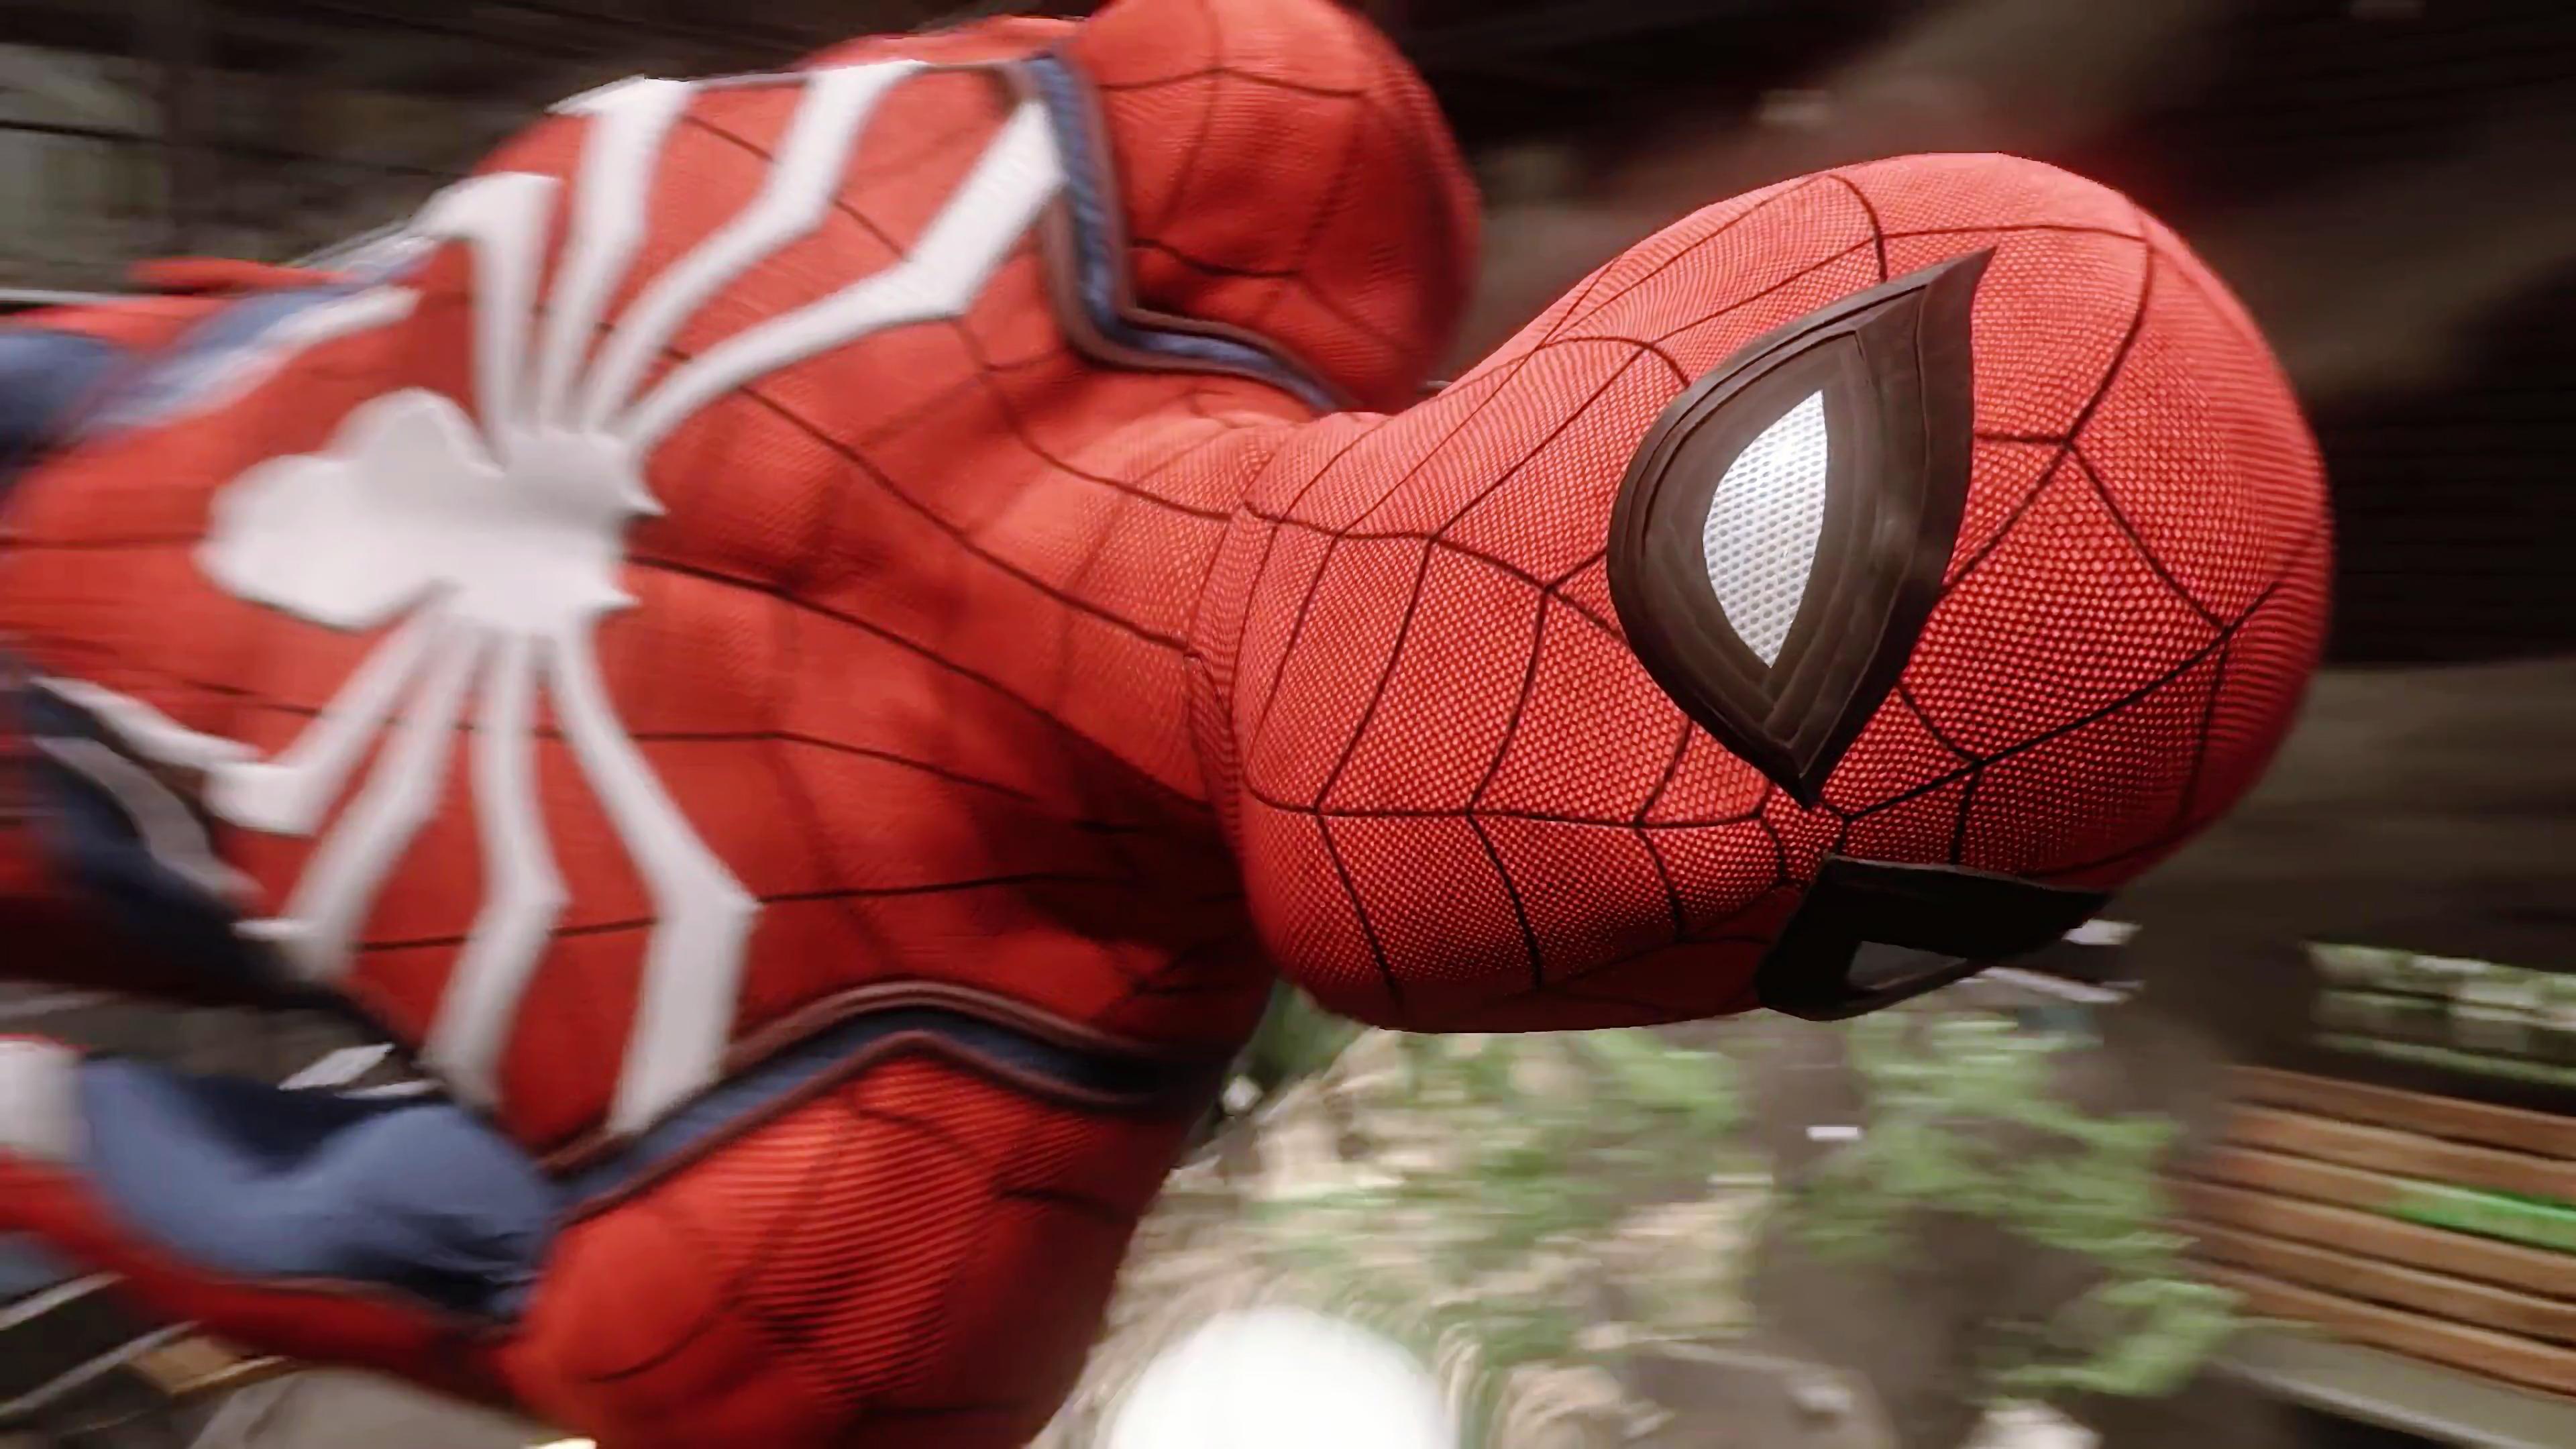 spiderman ps4 pro 4k game 2018 1537691604 - Spiderman PS4 Pro 4k Game 2018 - spiderman wallpapers, ps games wallpapers, hd-wallpapers, games wallpapers, 4k-wallpapers, 2018 games wallpapers